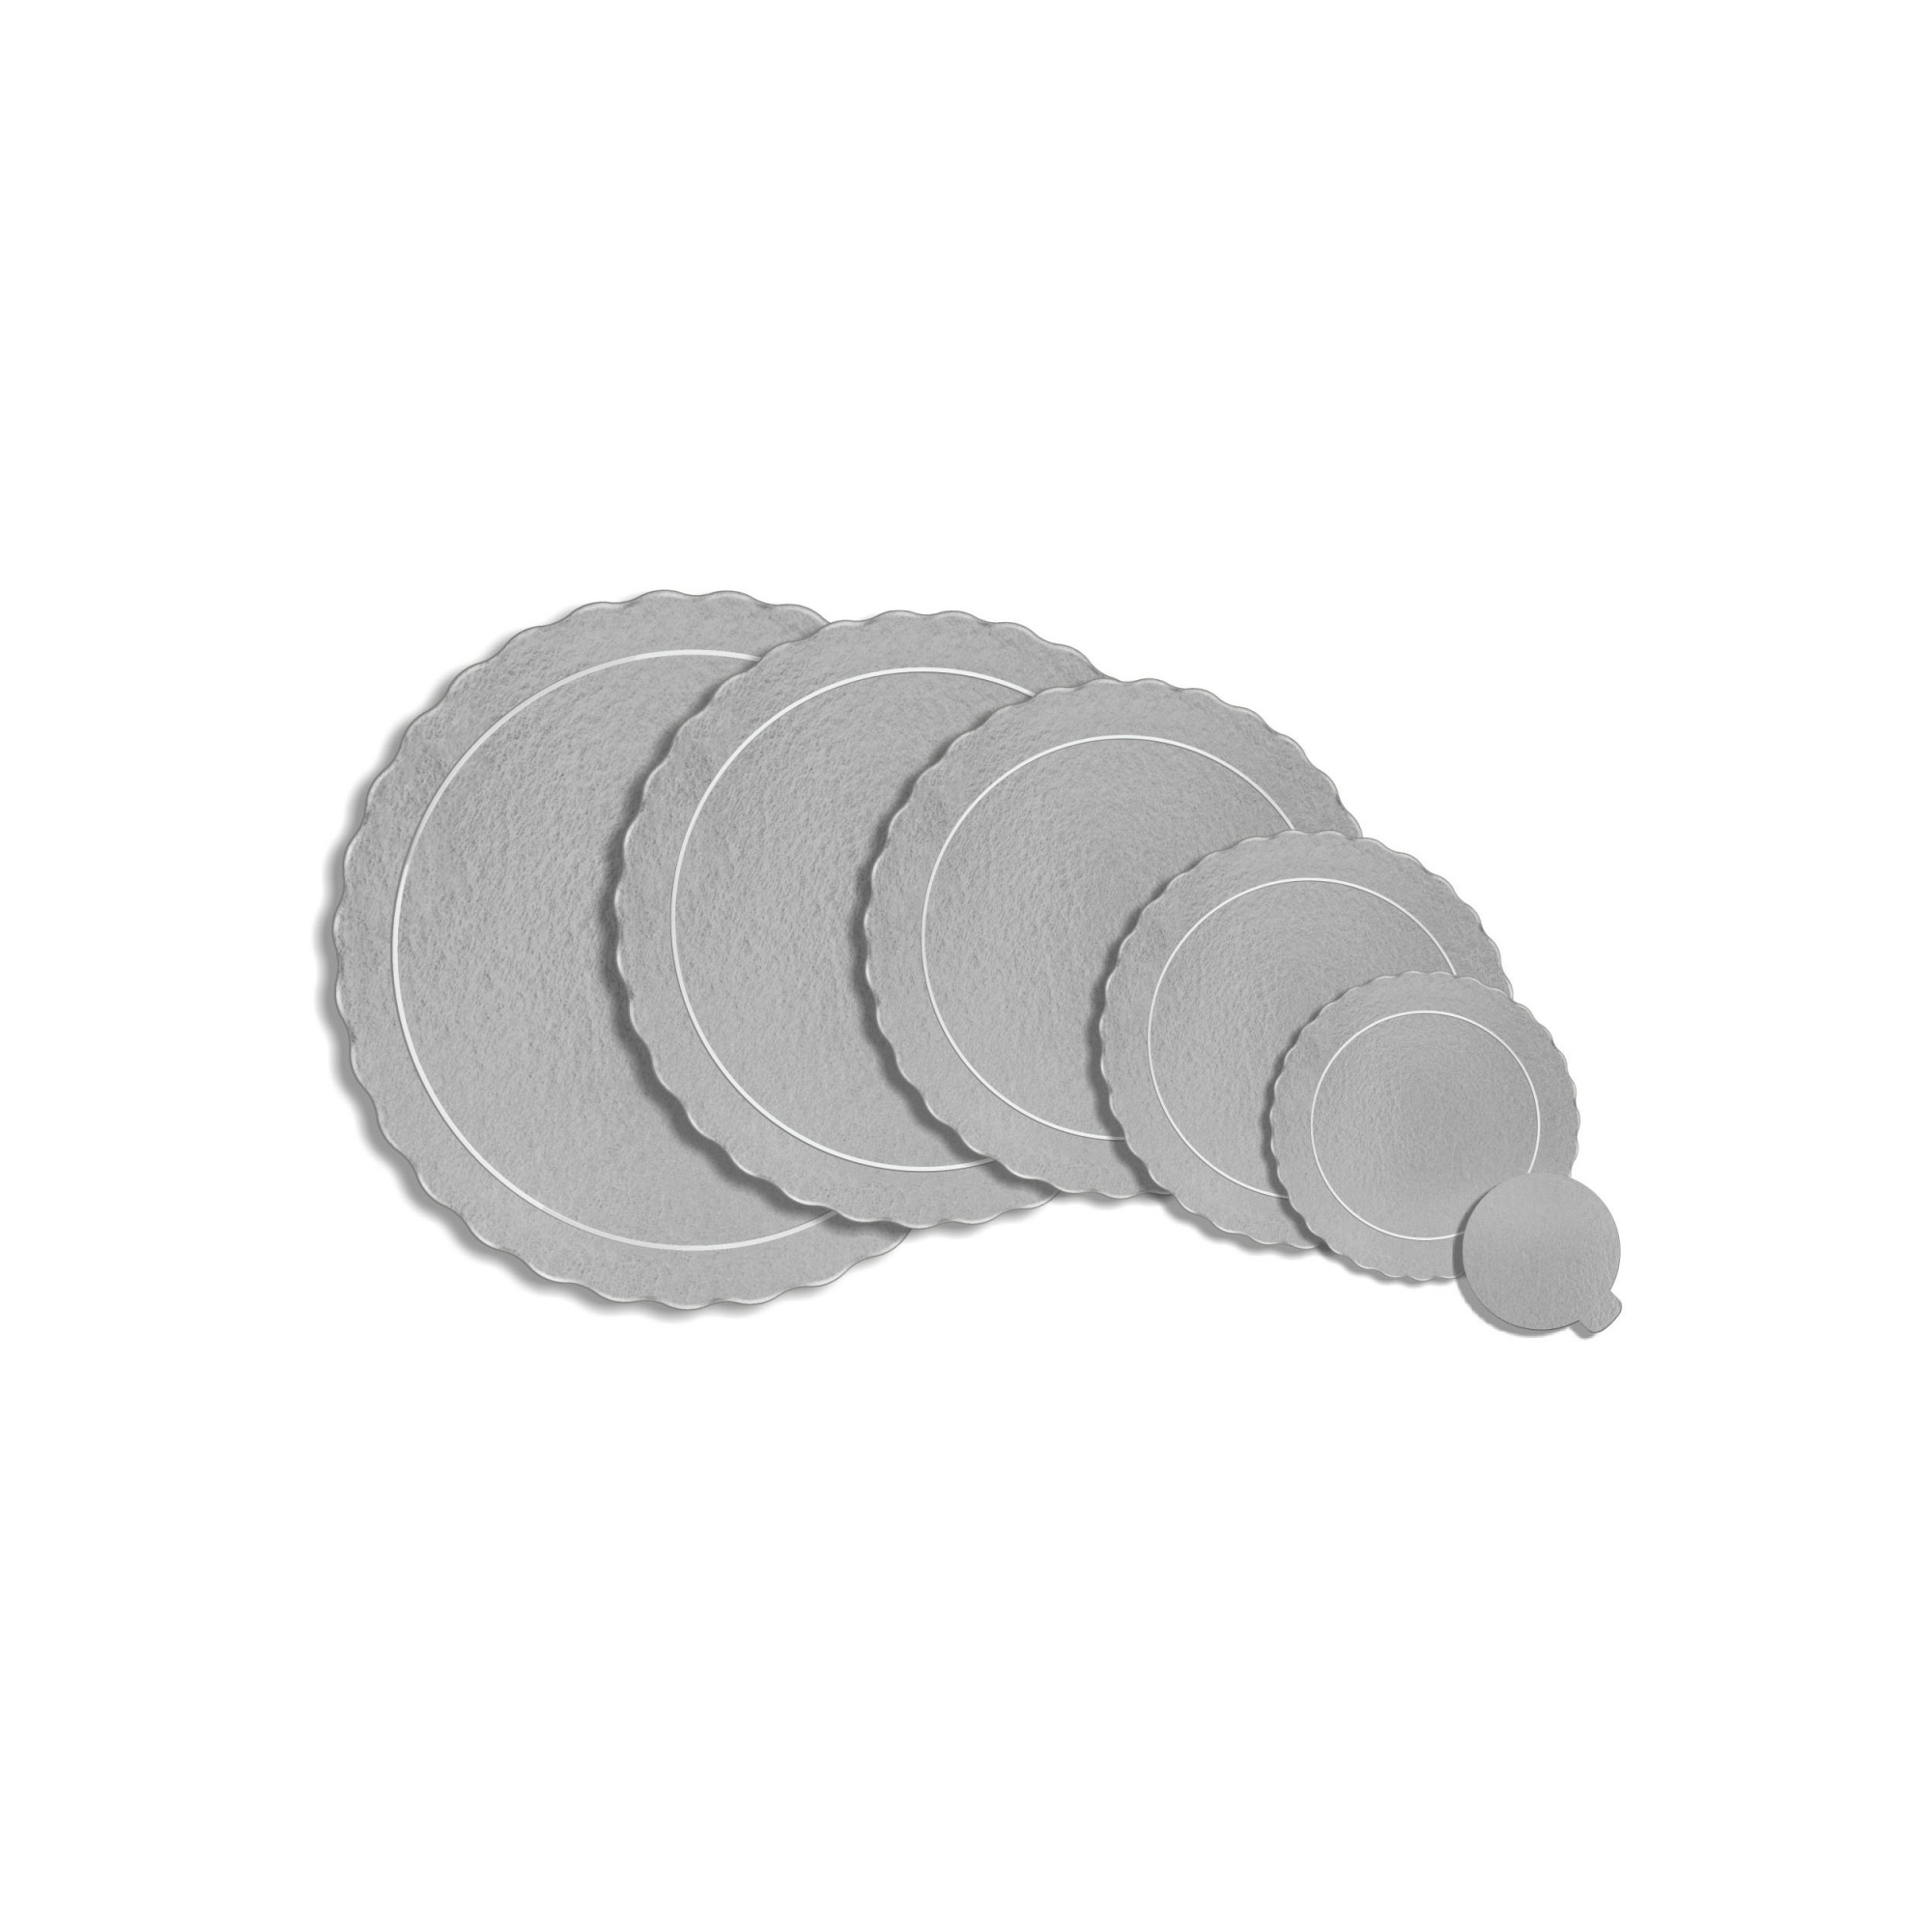 100 Bases Laminadas, Suporte P/ Bolo, Cake Board, Kit 25 e 28 cm - Prata